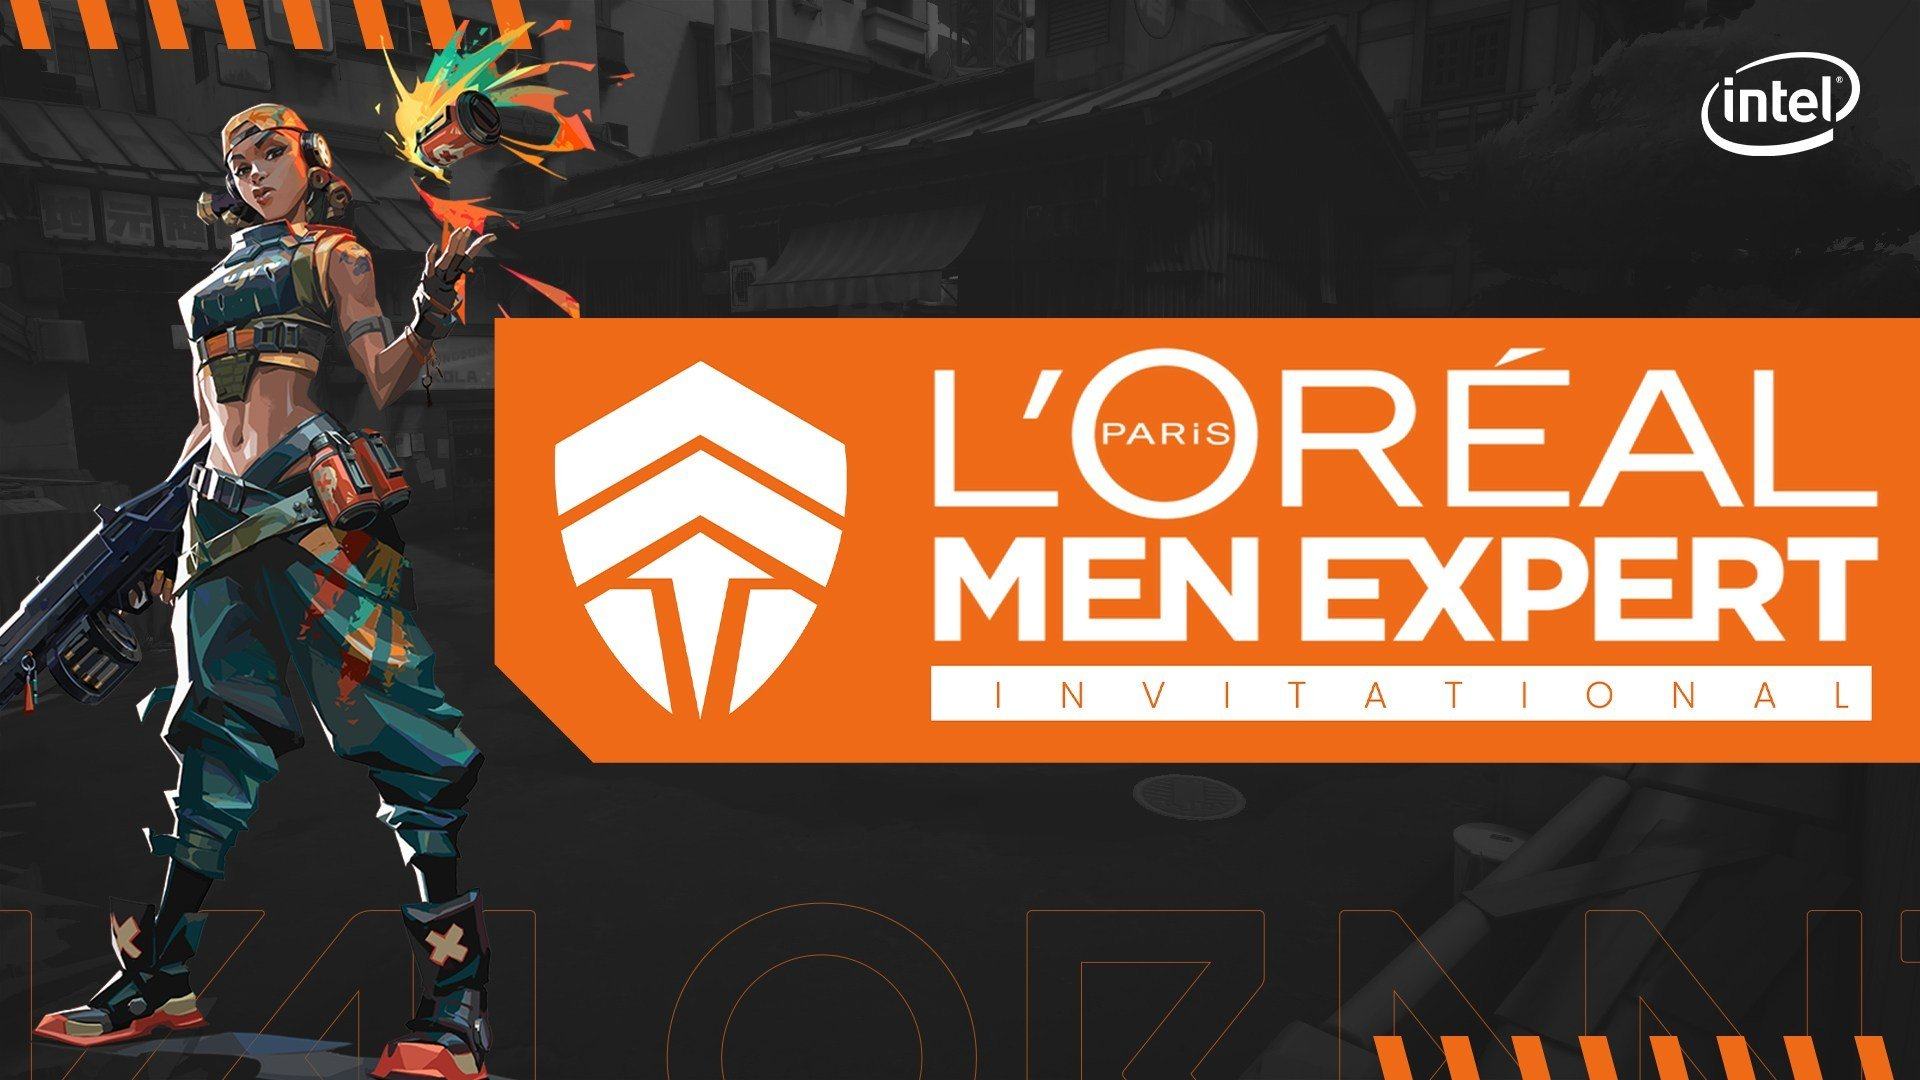 The Chiefs L'Oreal Men Expert Valorant Invitational